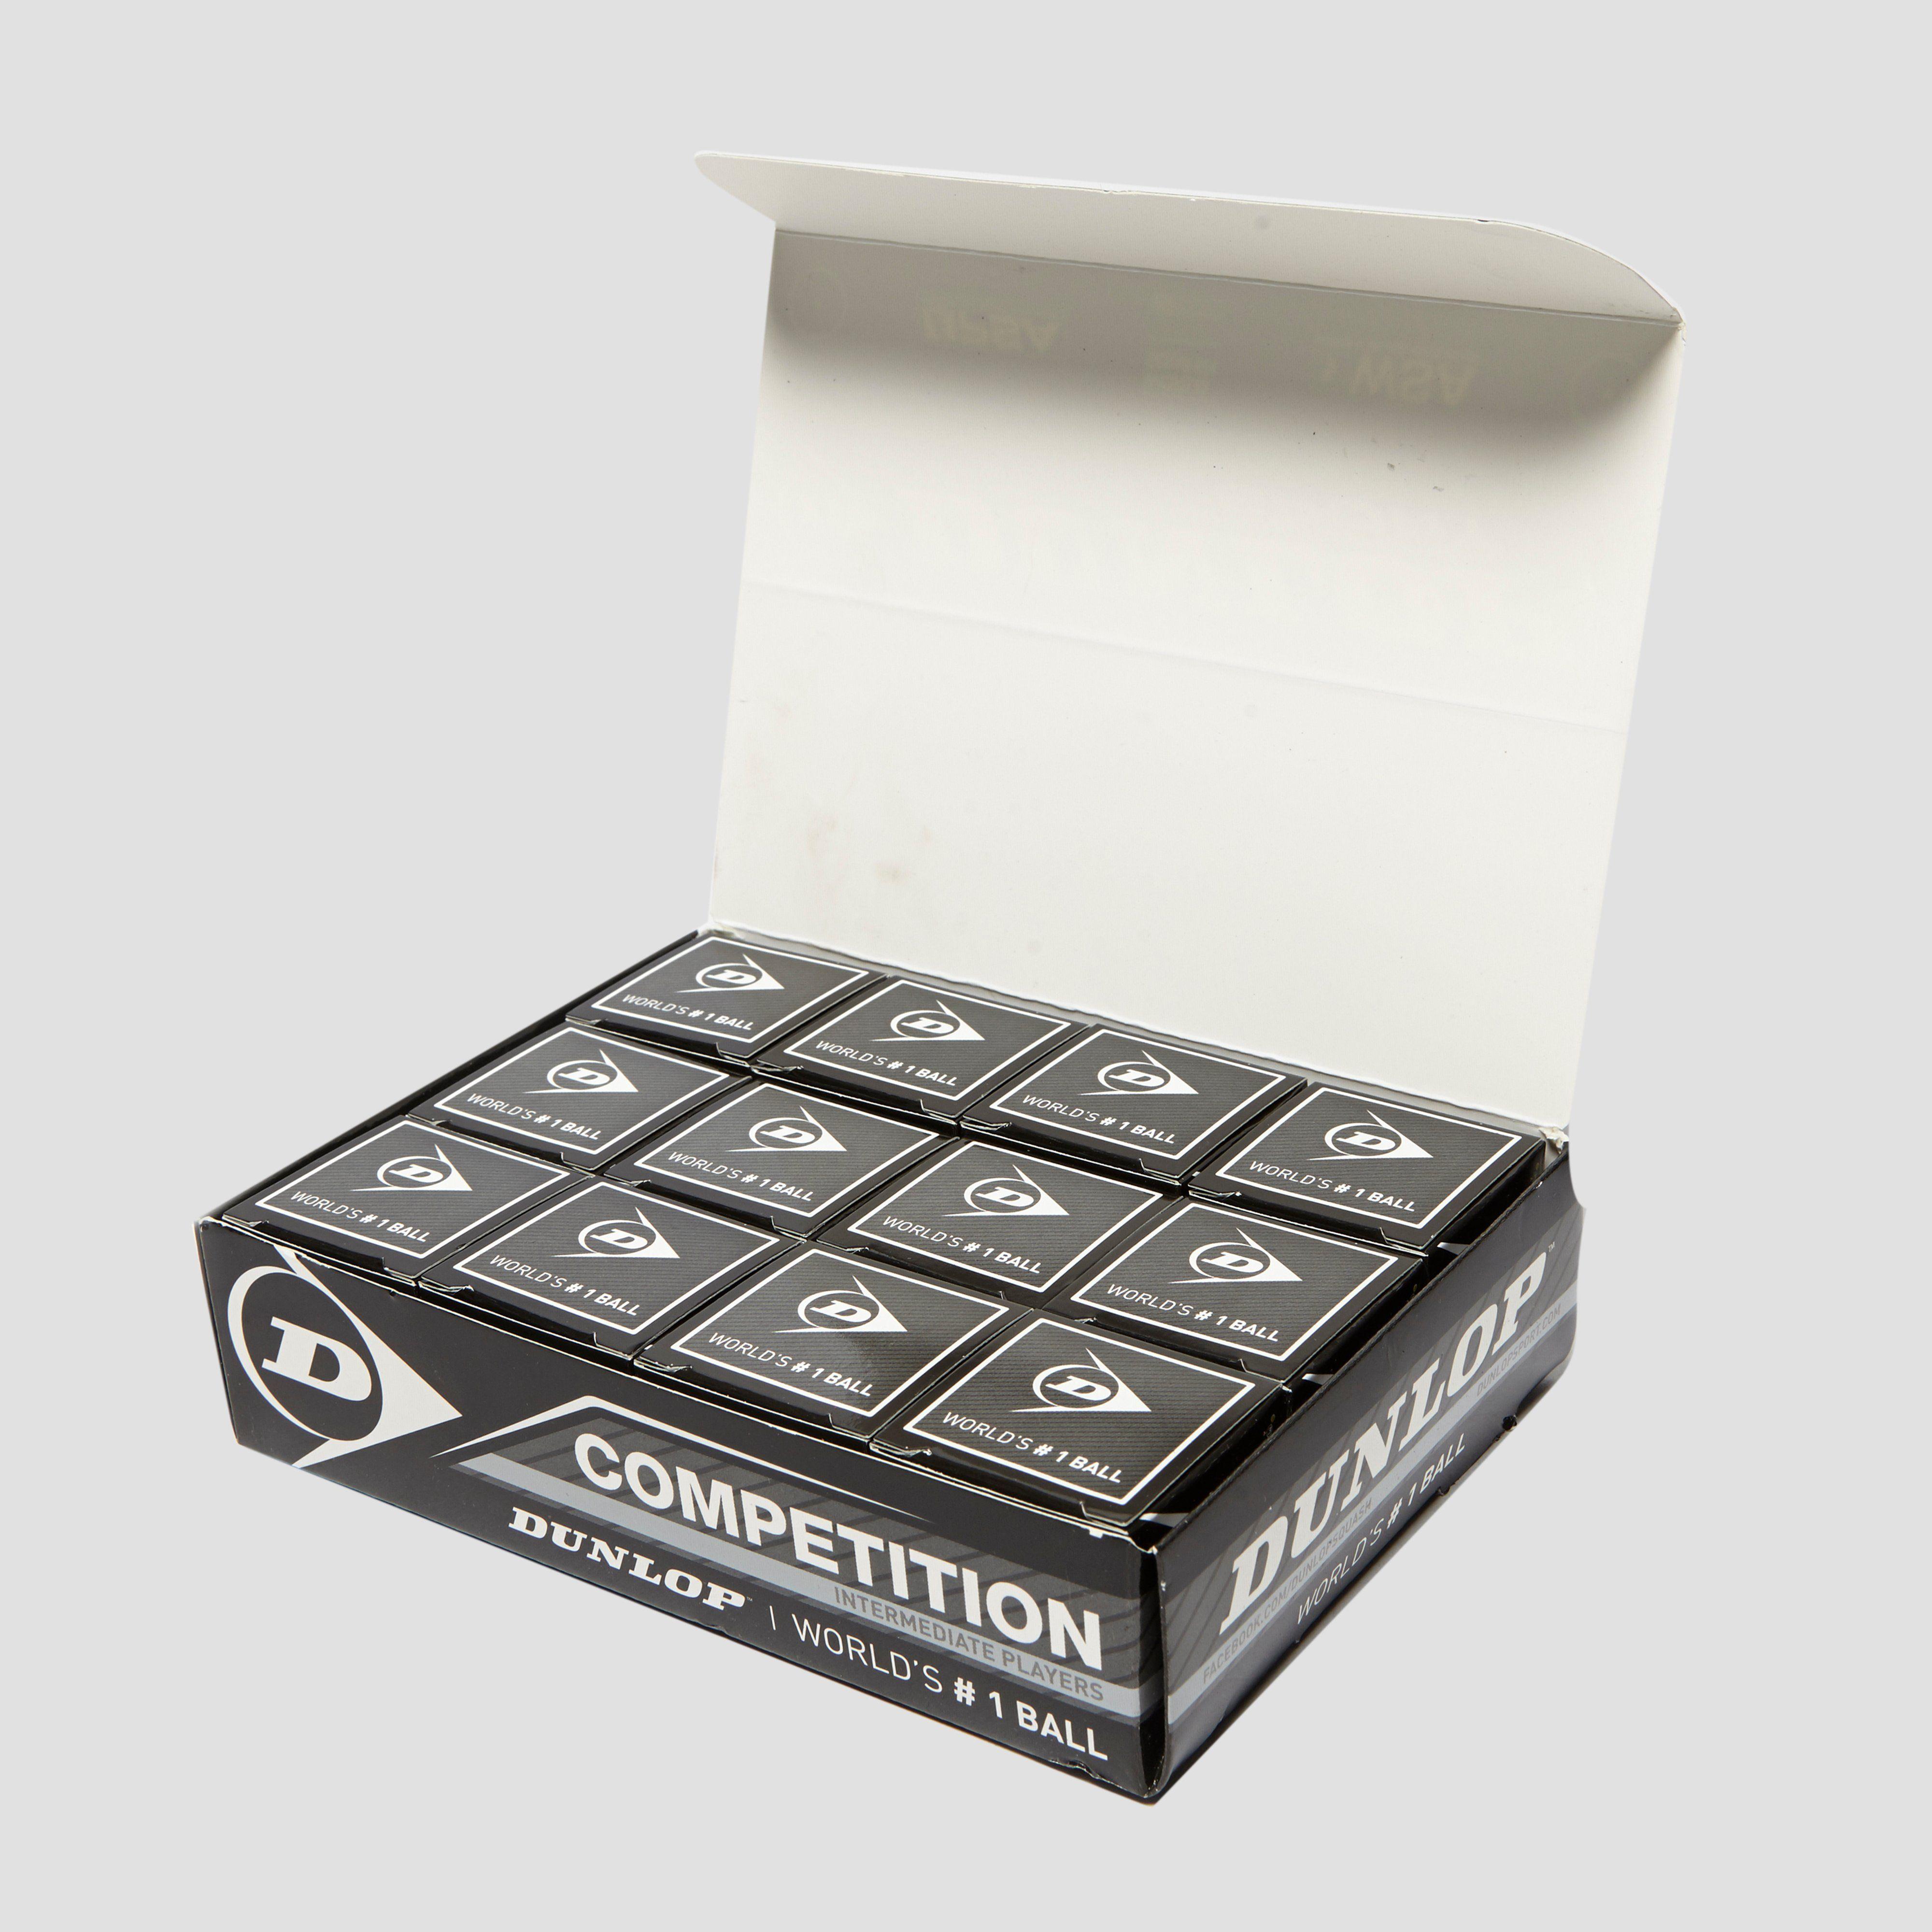 DUNLOP Competition Squash Balls (12 Ball Box)